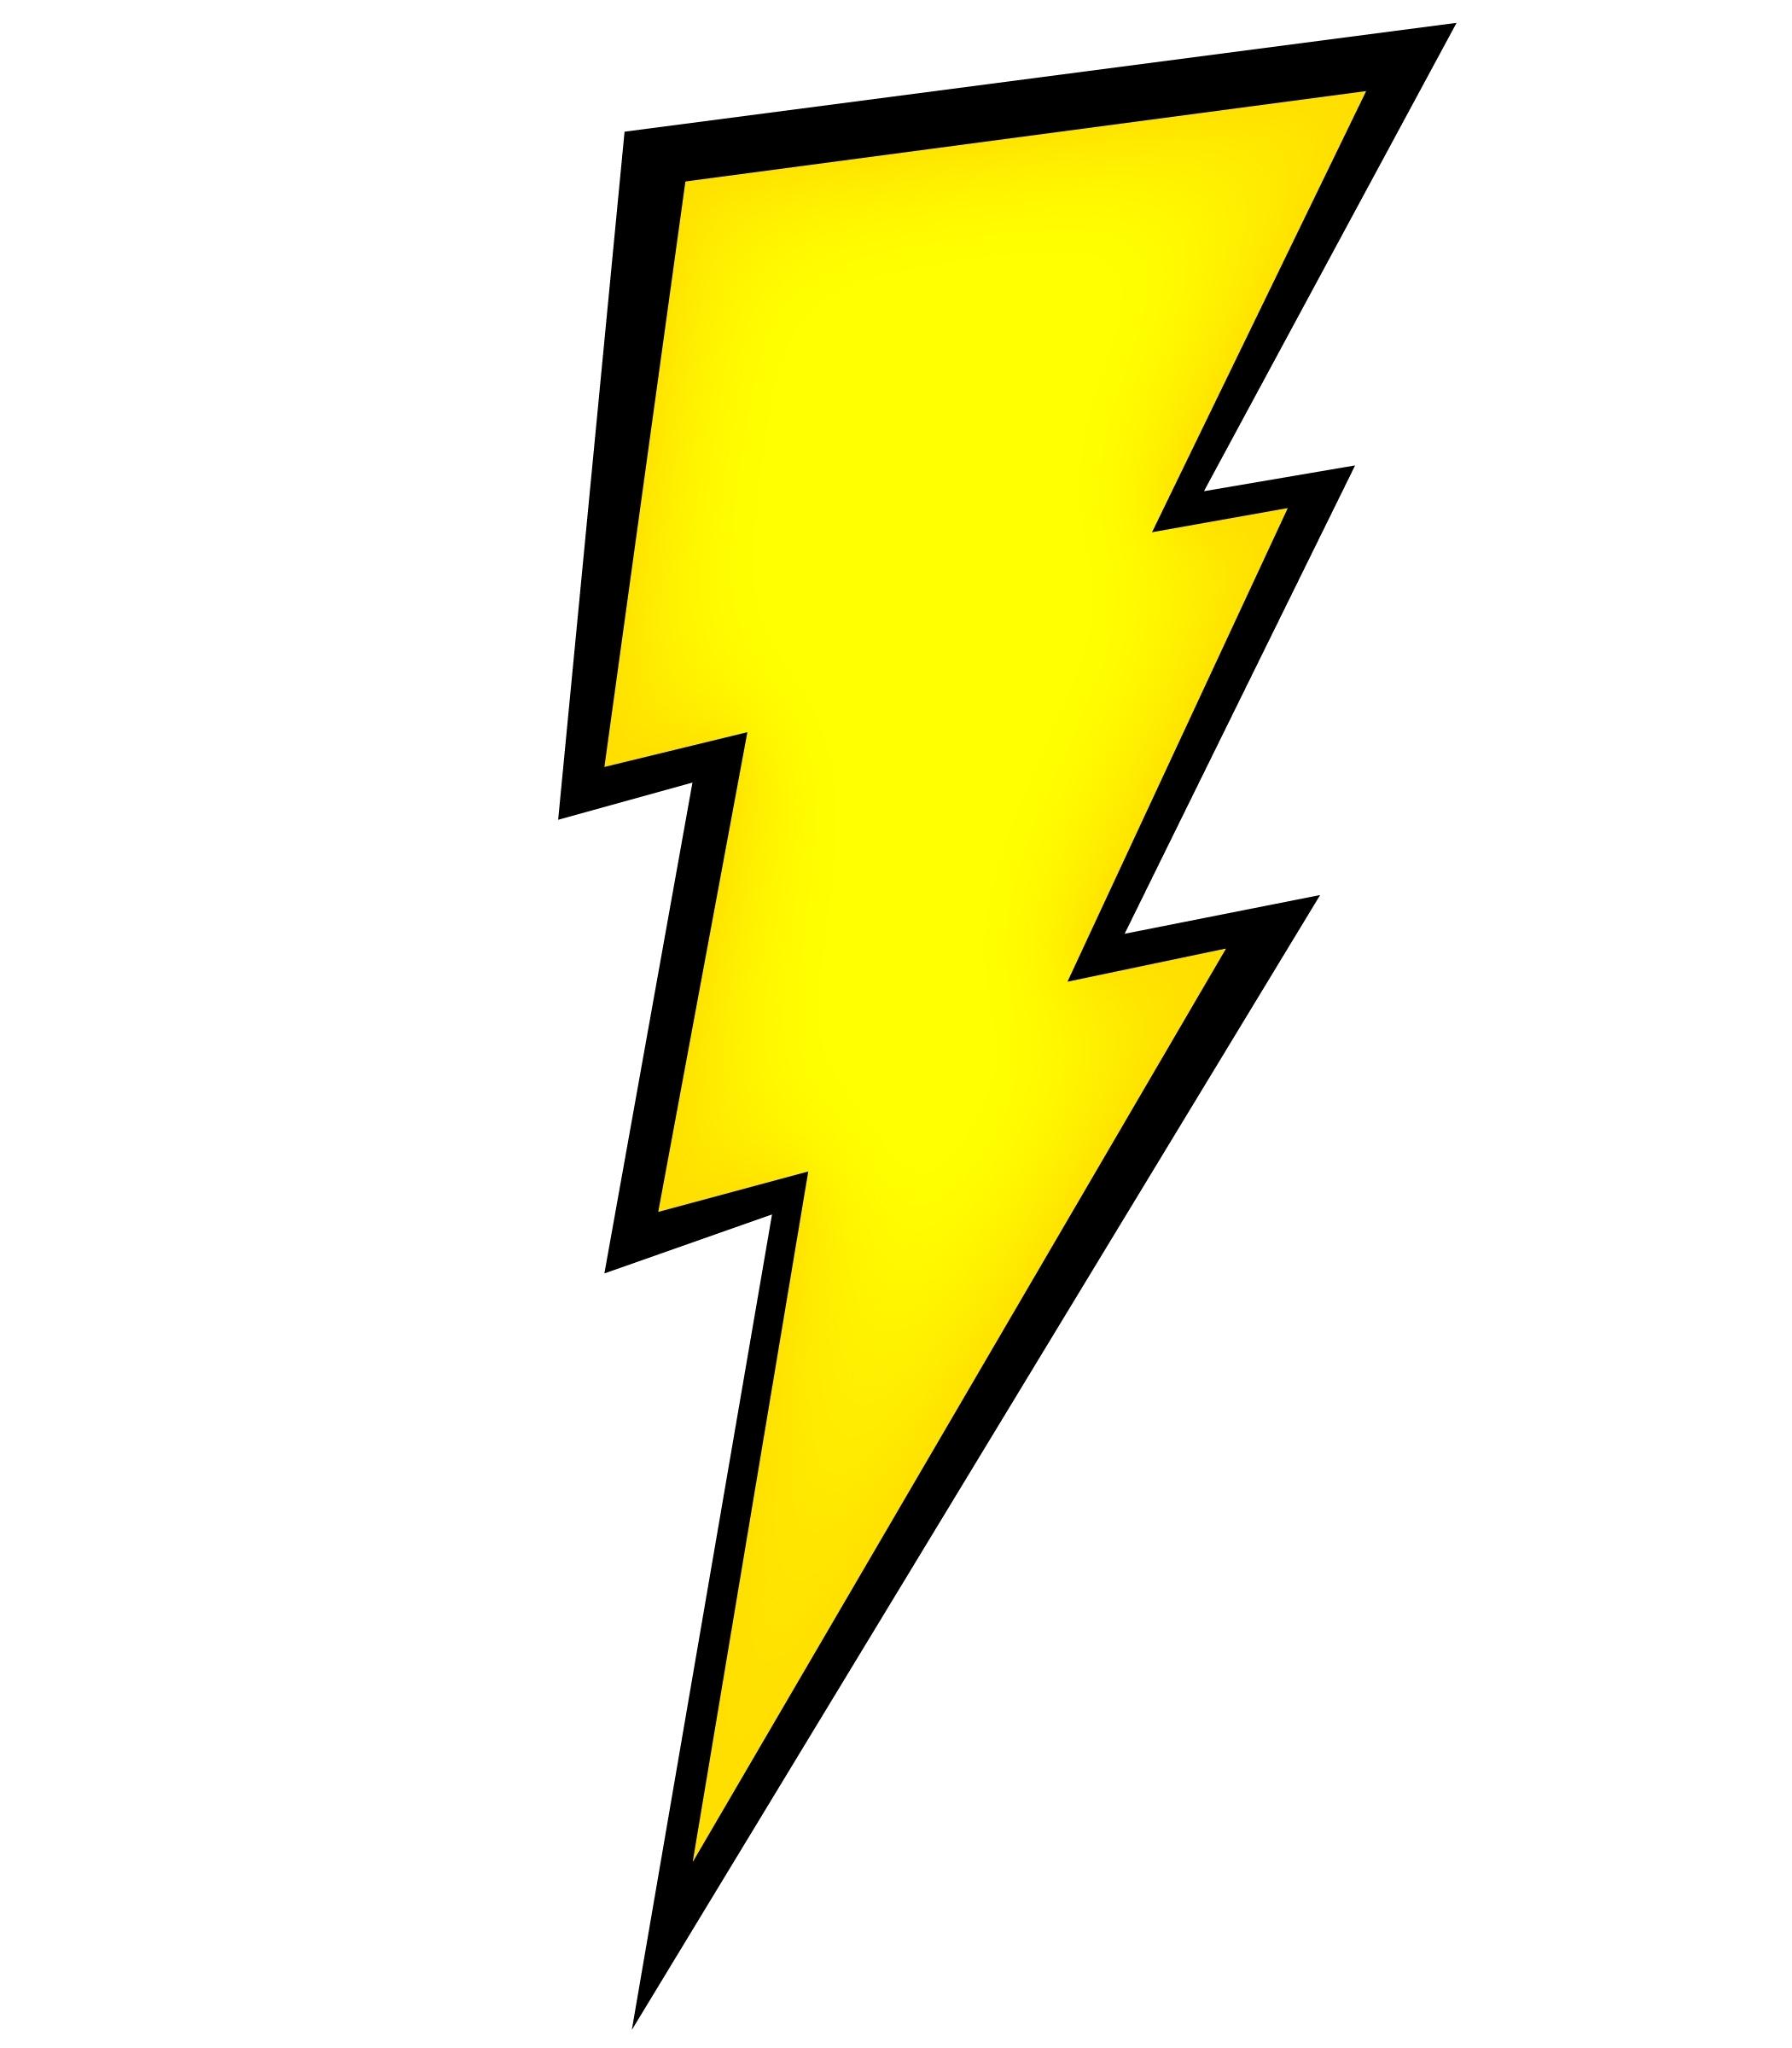 lightning bolt clipart-lightning bolt clipart-3